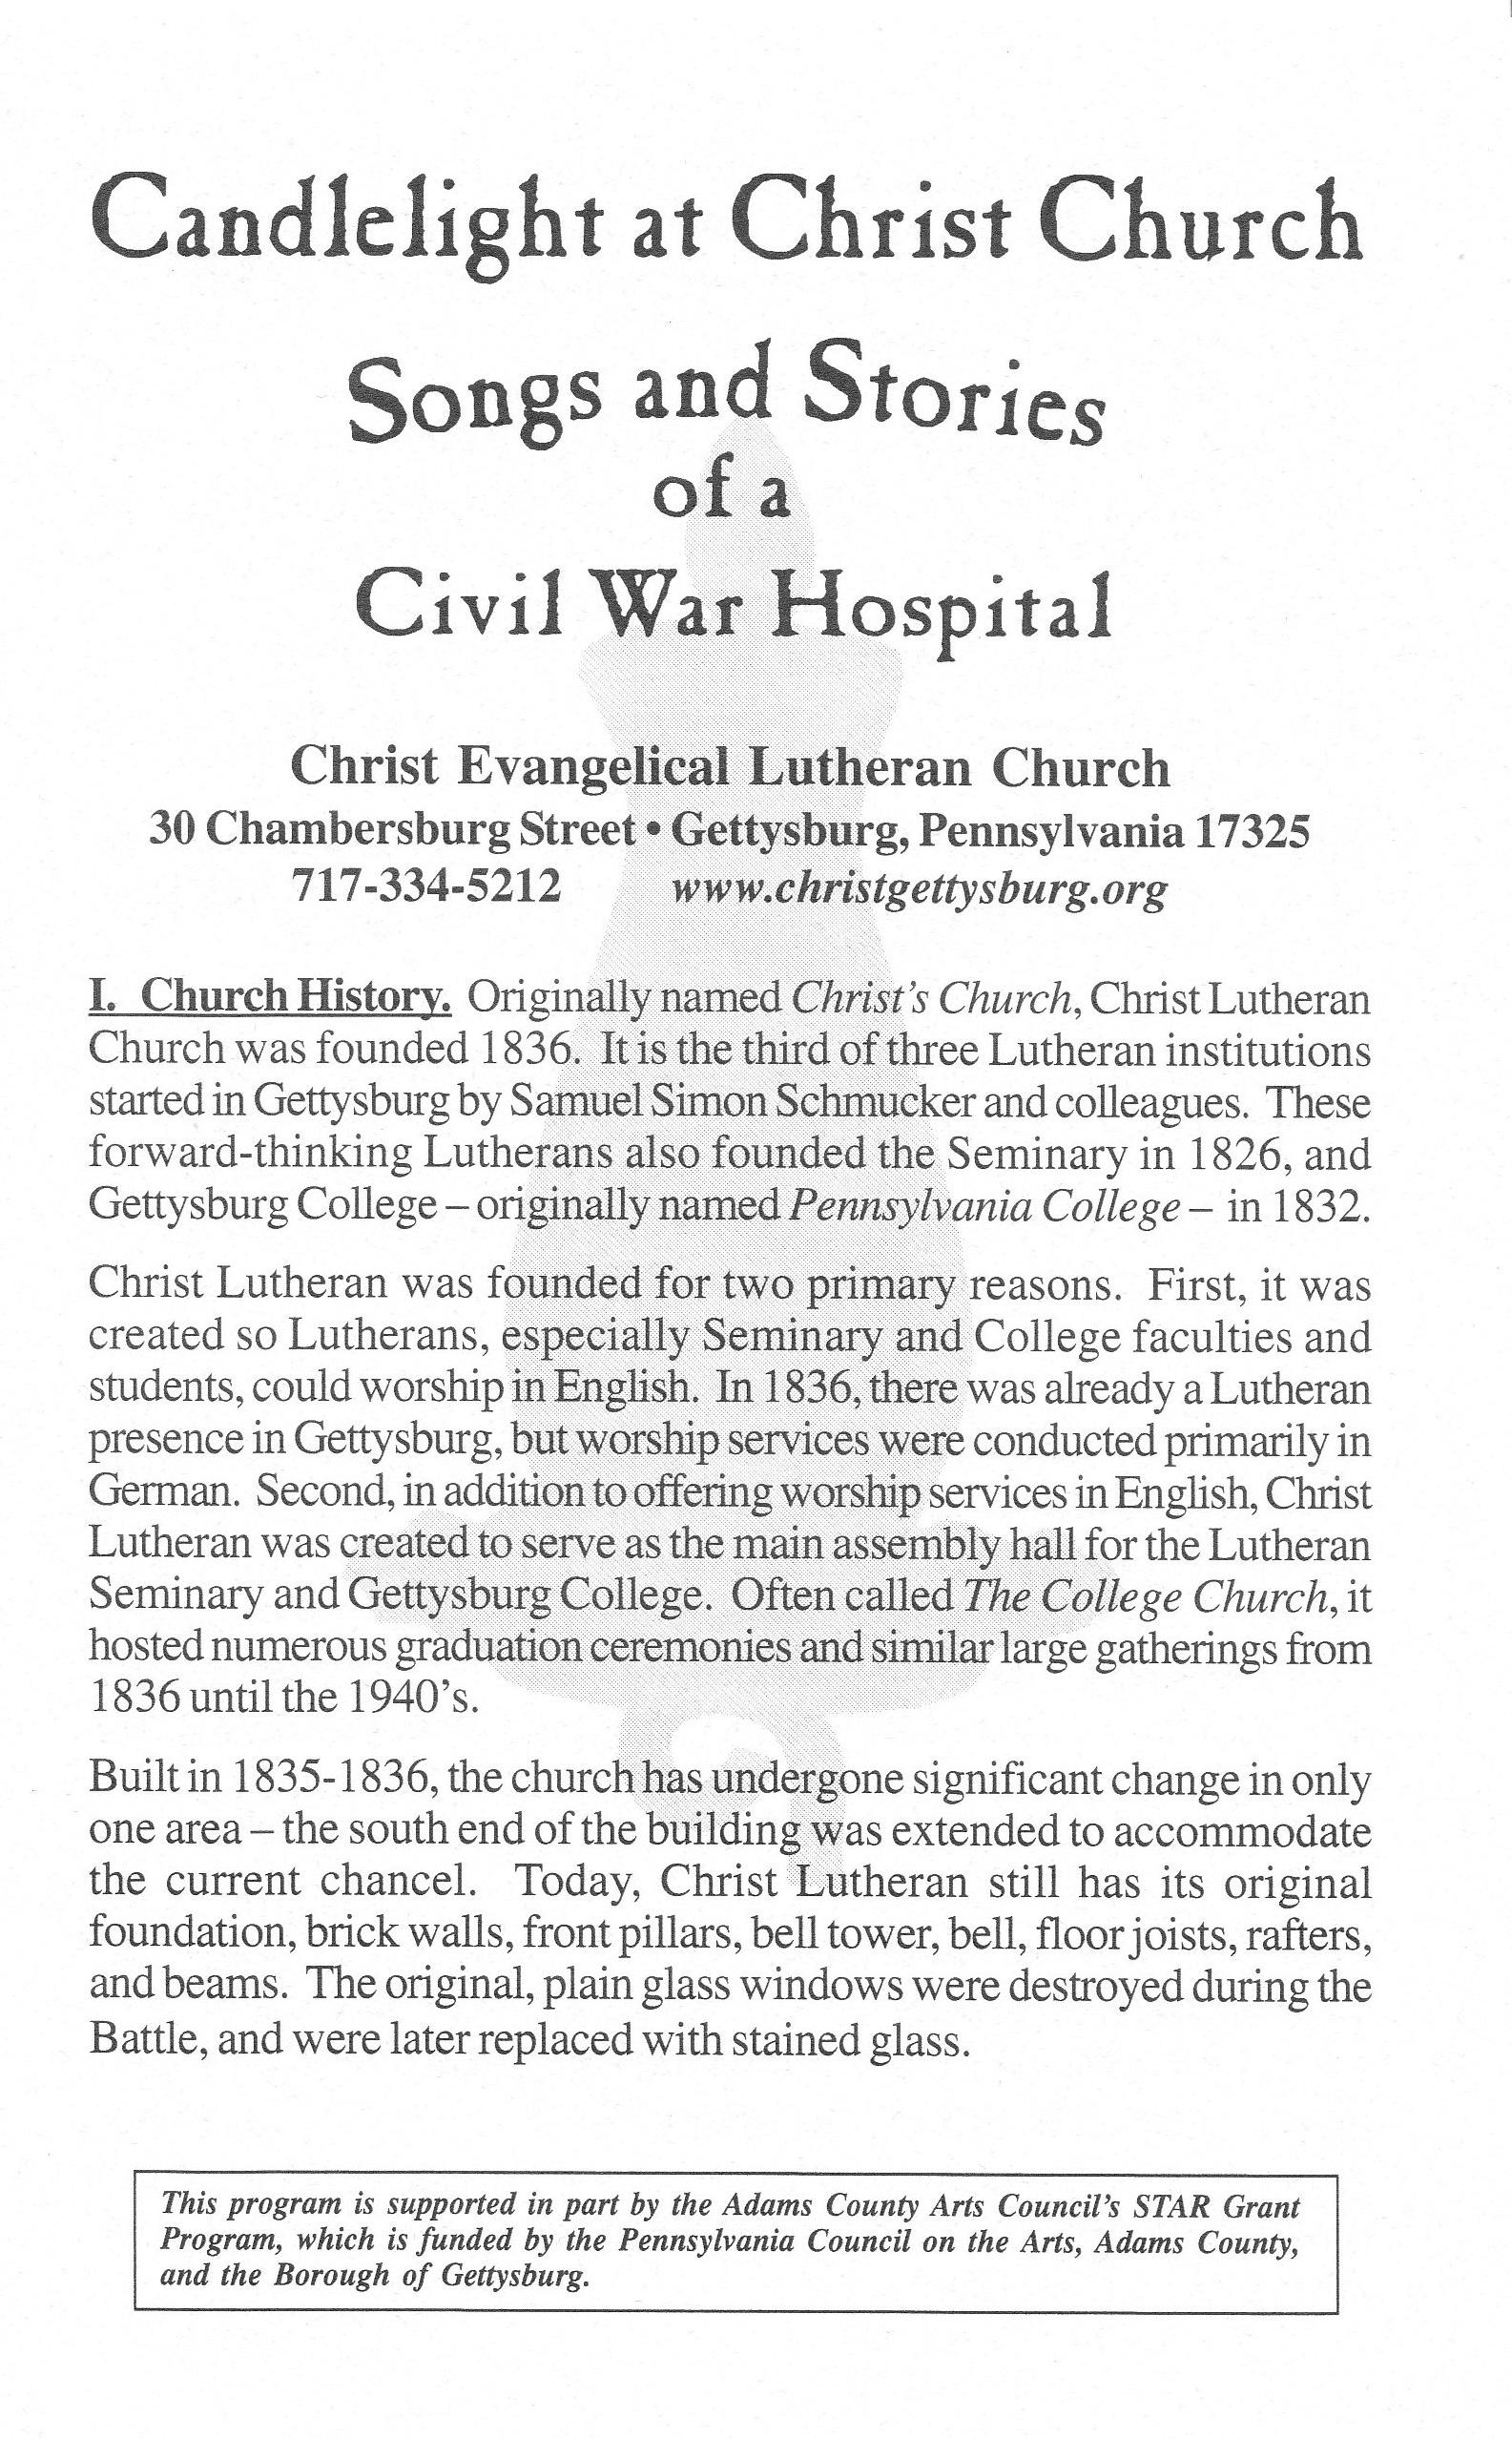 Gettysburg's Christ Lutheran Church Part 6, The Candlelight Program ...